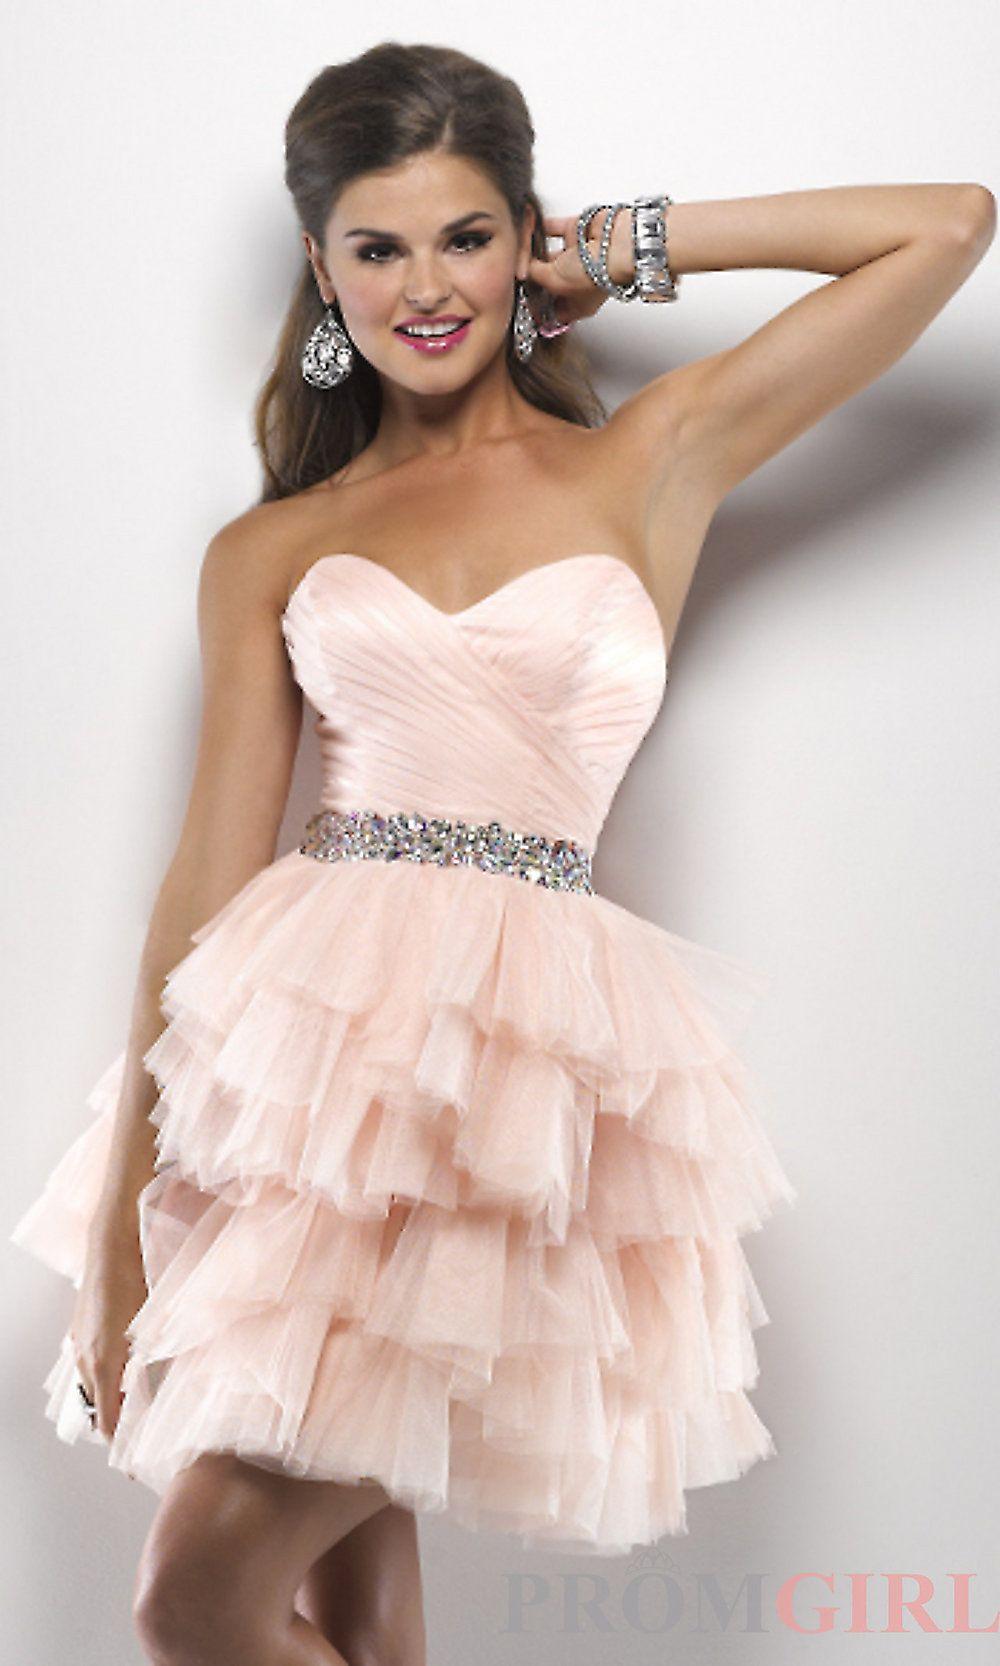 Blush pink short bridesmaid dress sweetheart neckline crystal belt blush pink short bridesmaid dress sweetheart neckline crystal belt tutu rushing ombrellifo Choice Image